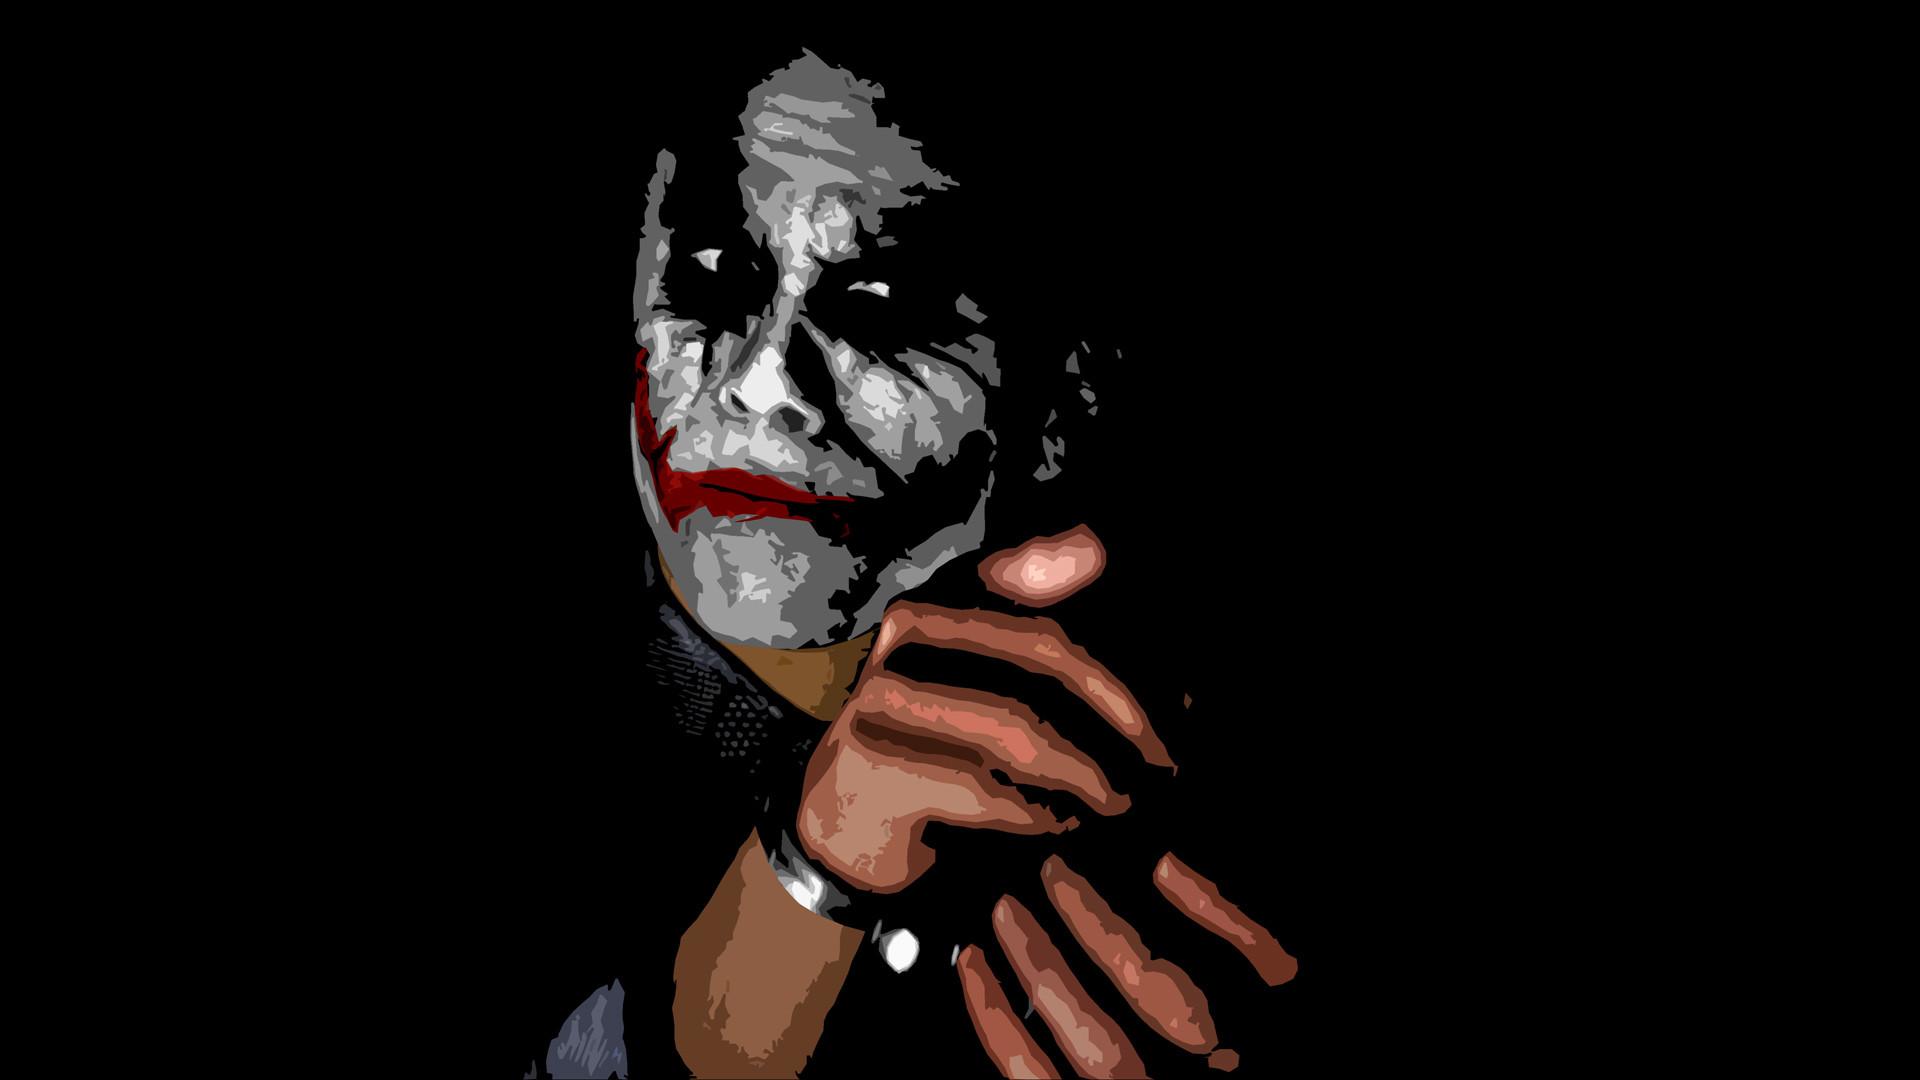 Heath Ledger Joker Wallpaper HD – WallpaperSafari | #ICU | Pinterest | Heath  ledger joker wallpaper, Heath ledger joker and Heath ledger